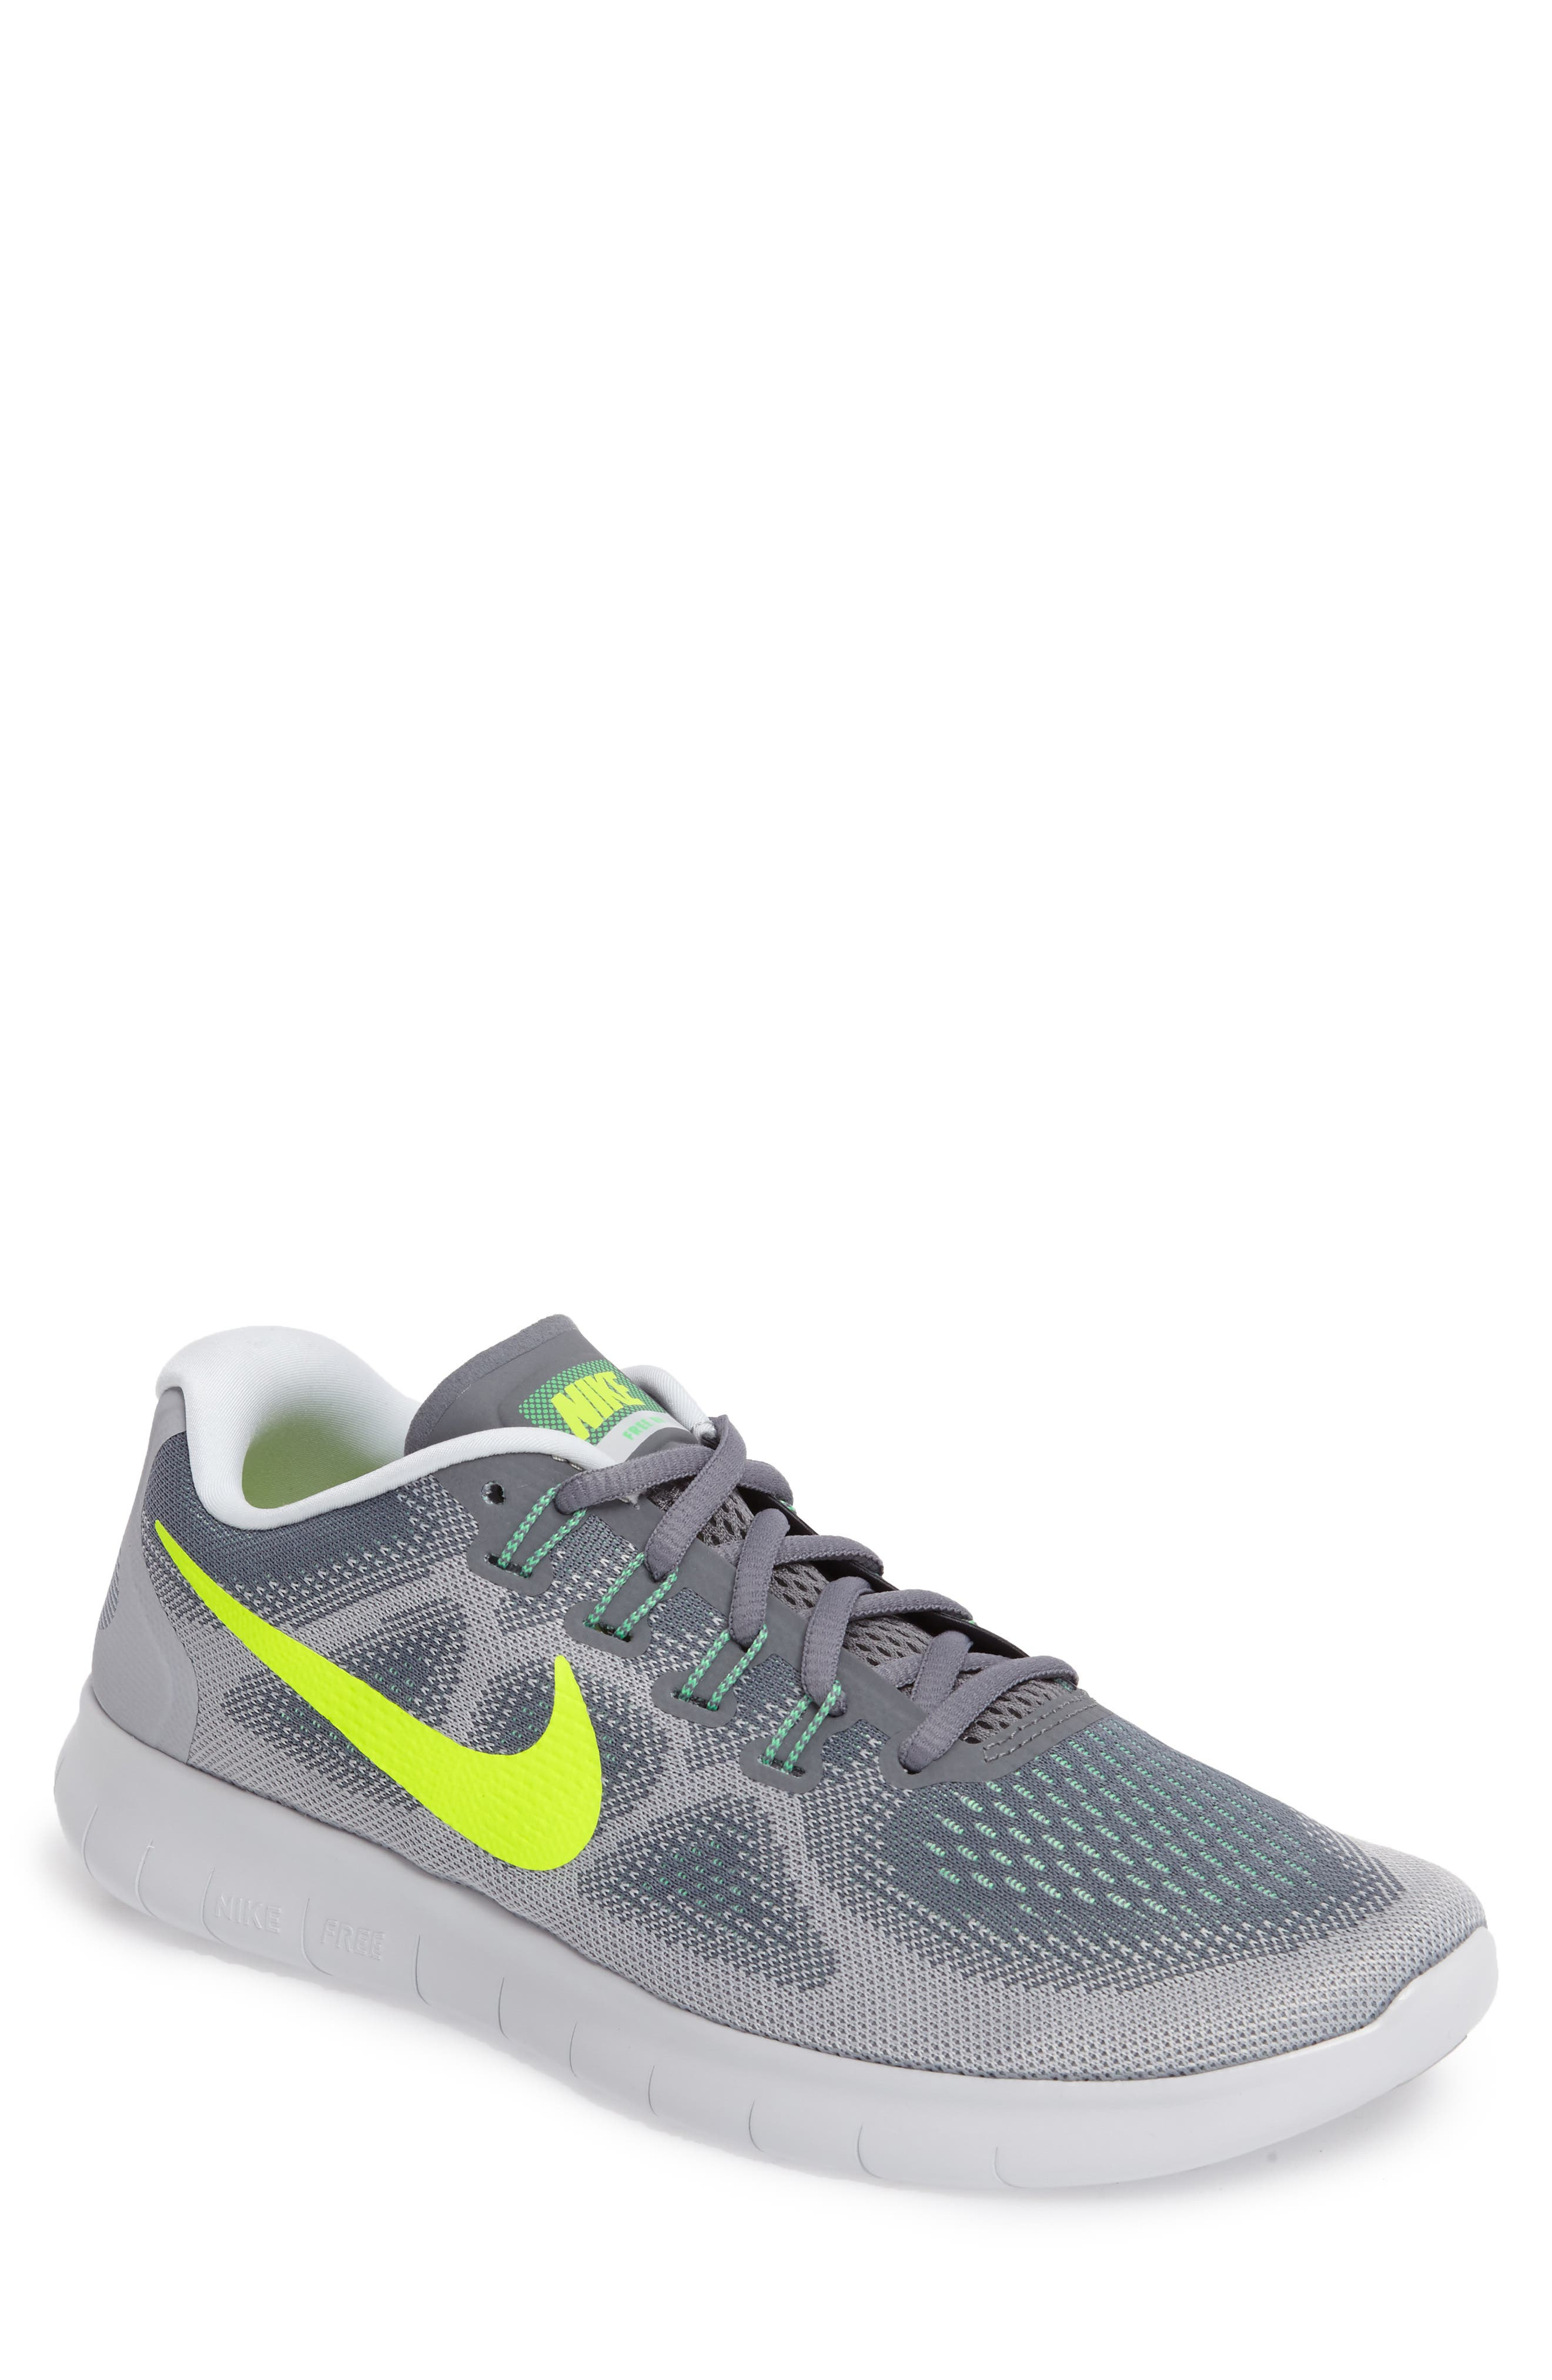 Free Run 2017 Running Shoe,                             Main thumbnail 1, color,                             Grey/ Volt/ Grey/ Green